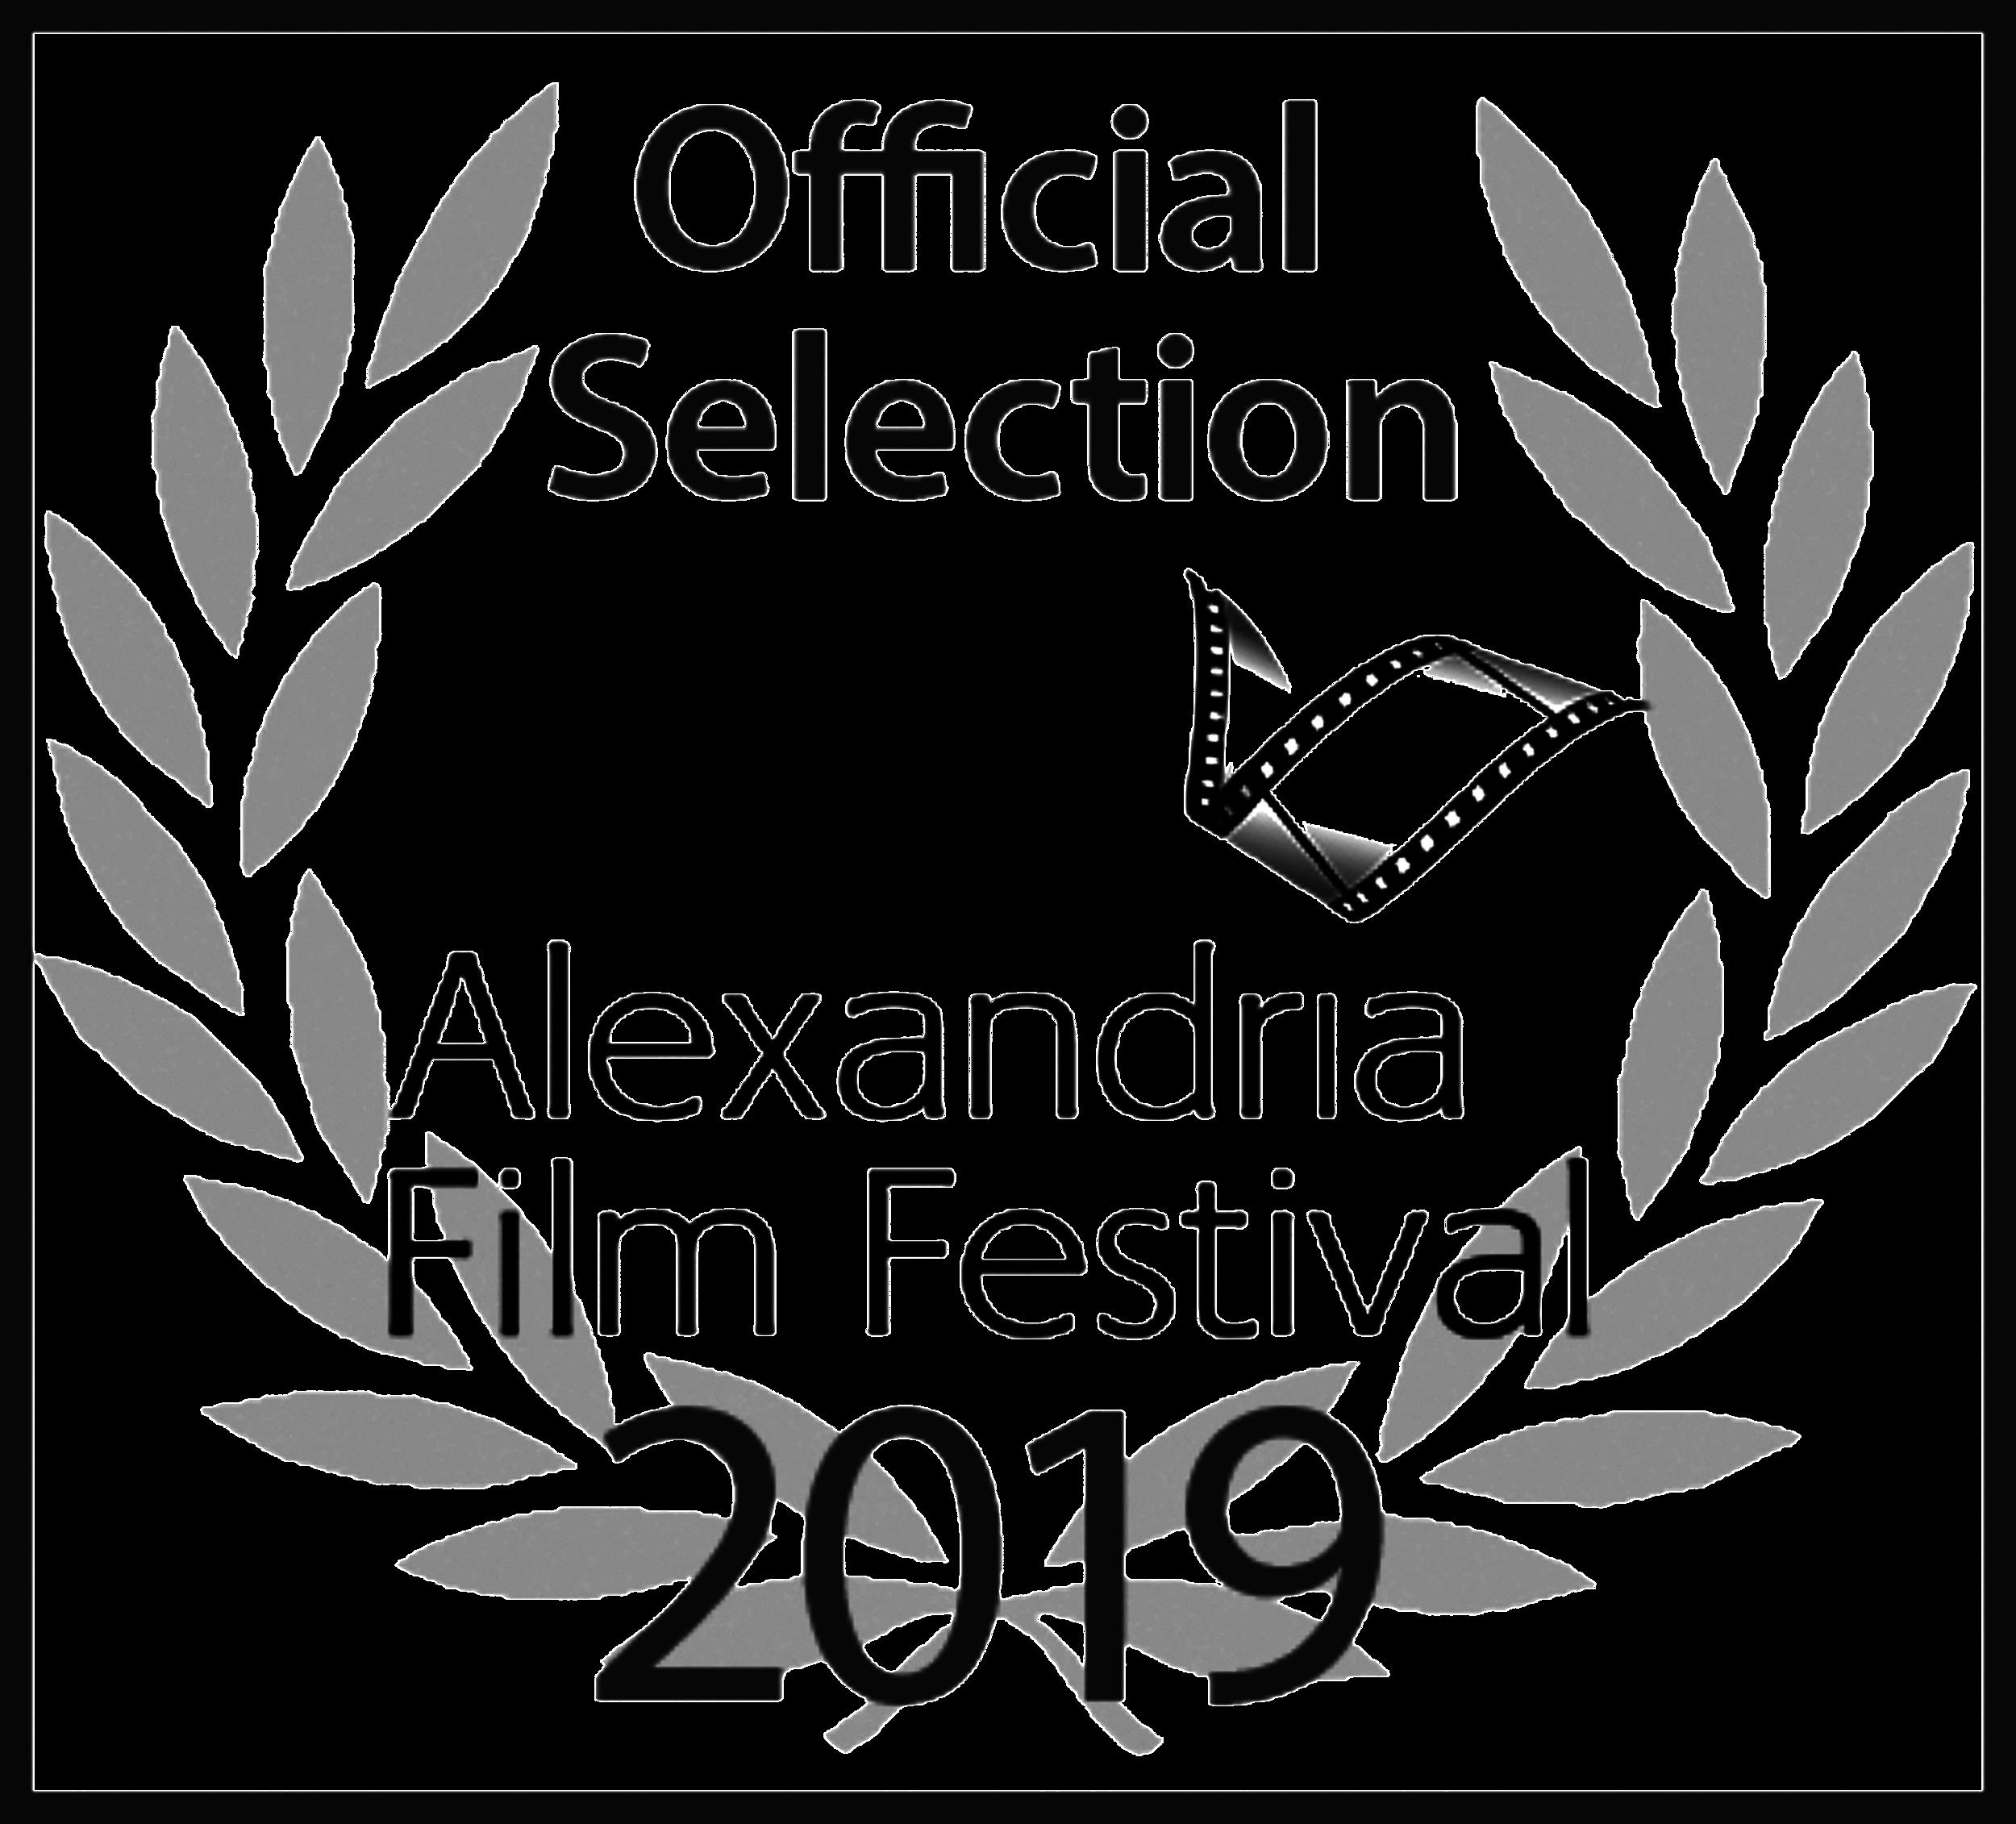 Alexandria-OfficialSelection-Award_2019.png